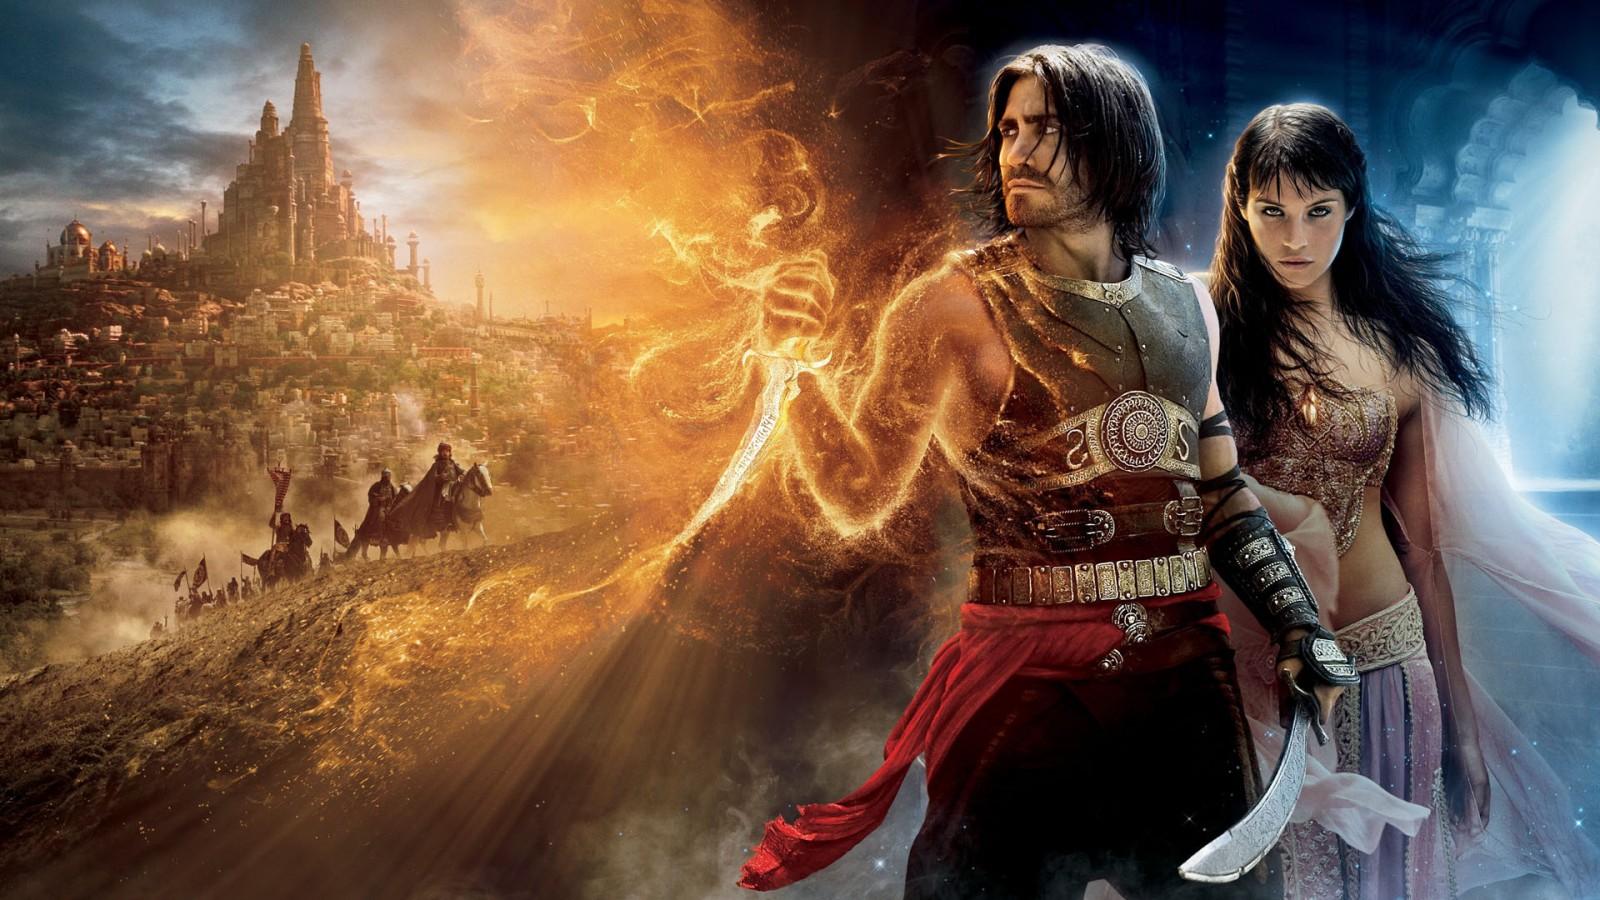 Prince Of Persia 3d Wallpaper Prince Of Persia Sands Of Time Wallpapers Hd Wallpapers